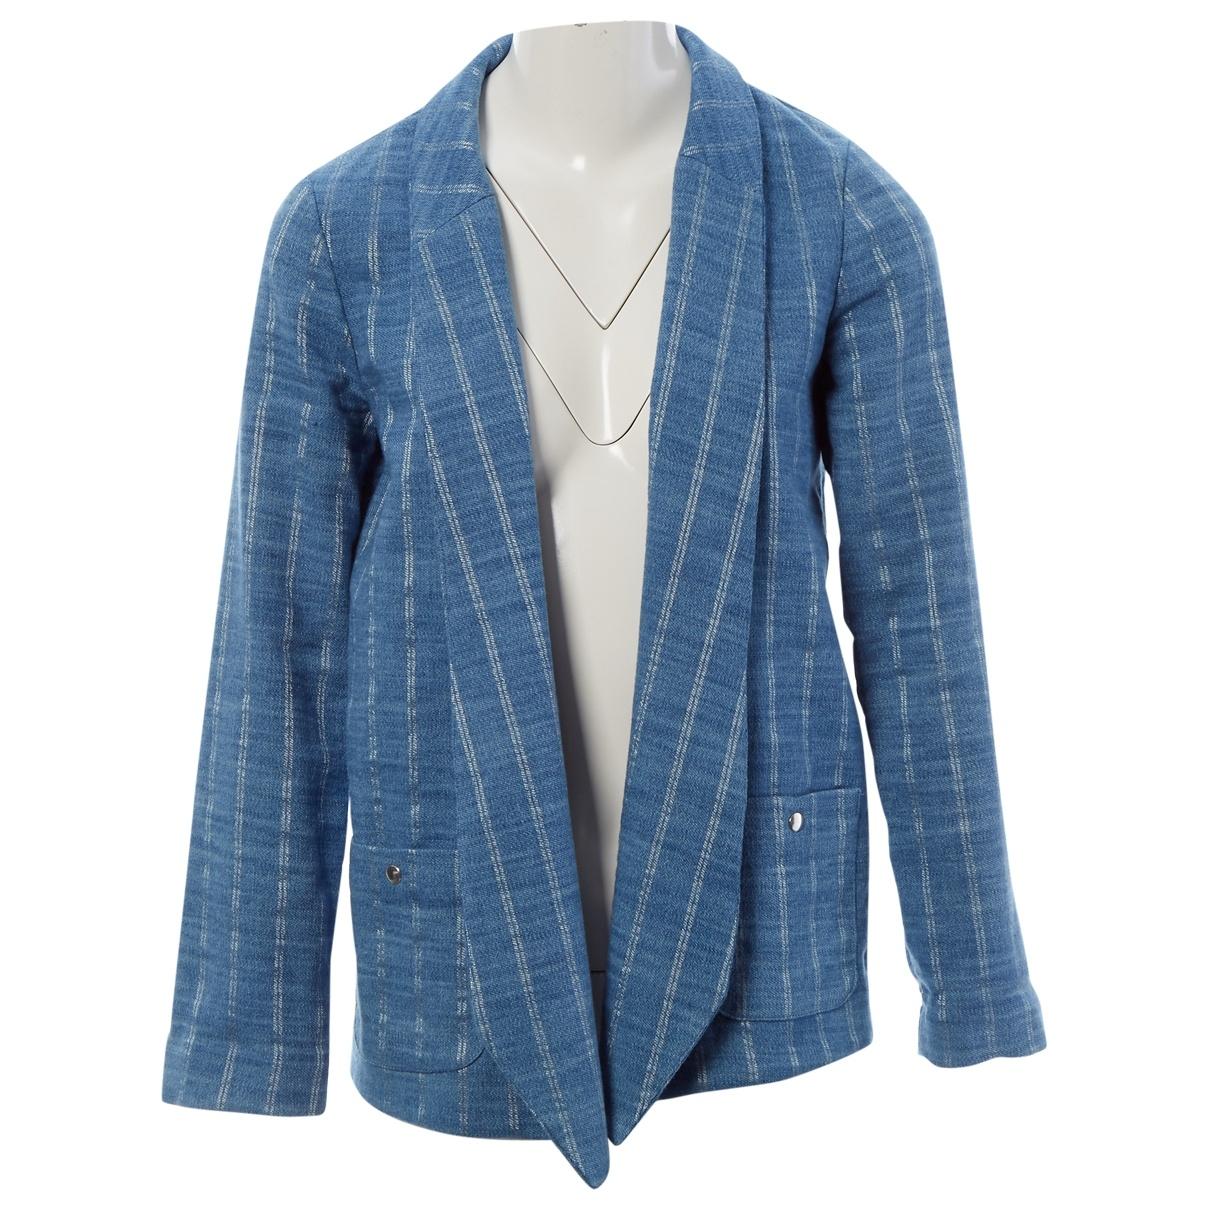 Roseanna \N Blue Denim - Jeans jacket for Women 38 FR